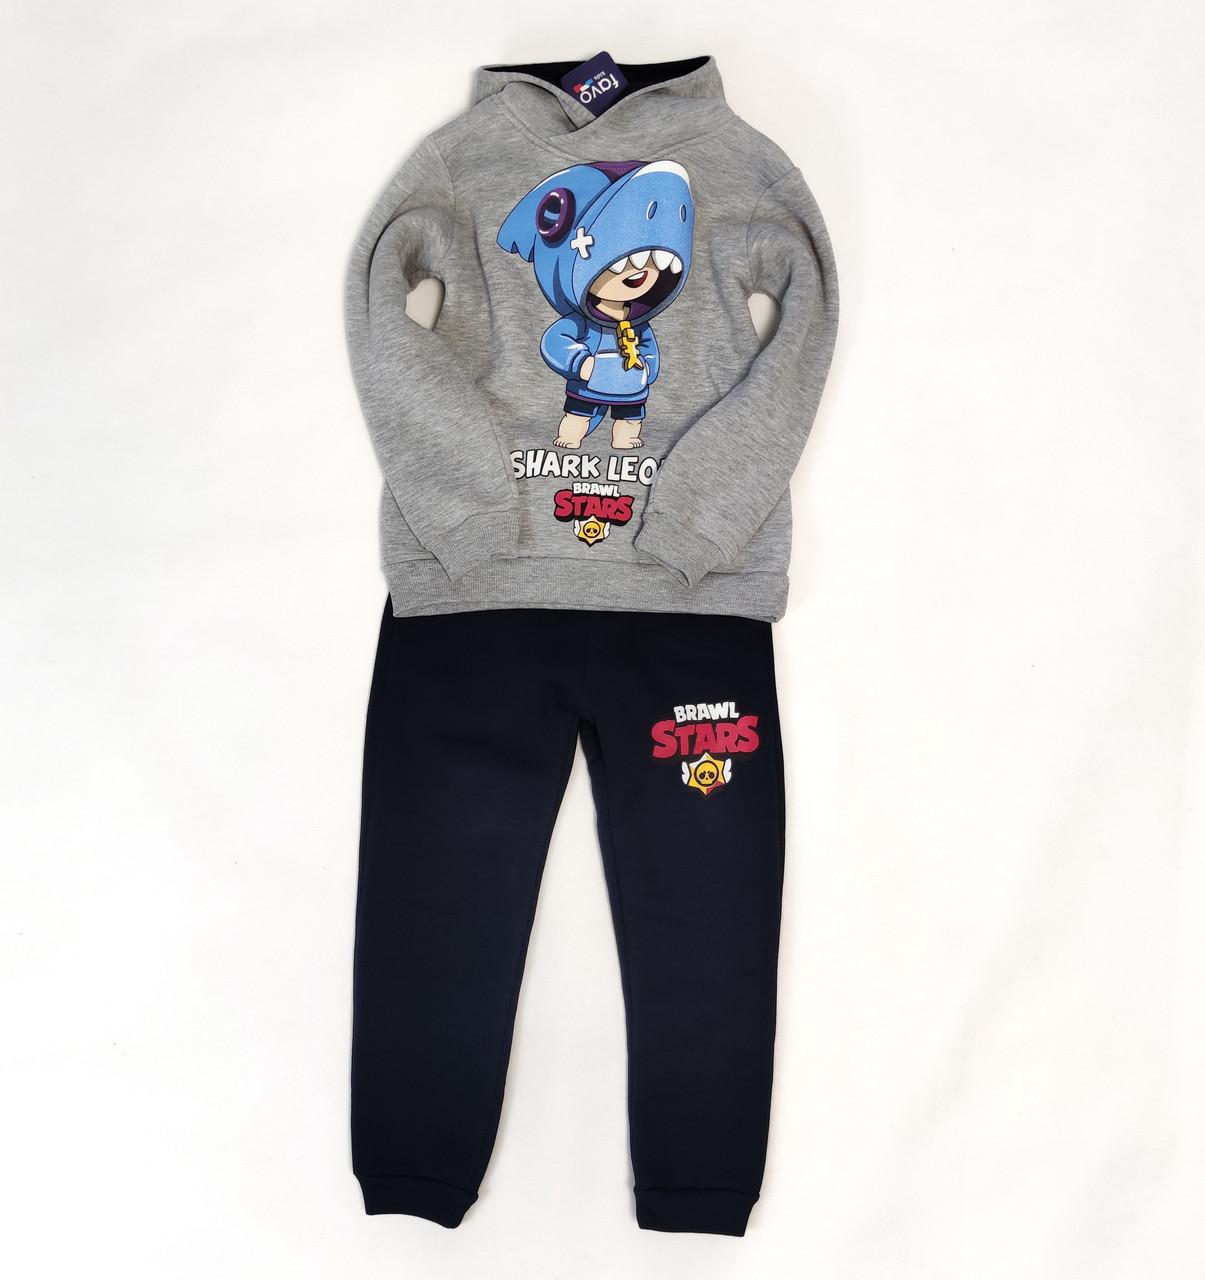 Бравл Старс brawl stars утепленный теплый костюм для мальчика кофта реглан штаны серый